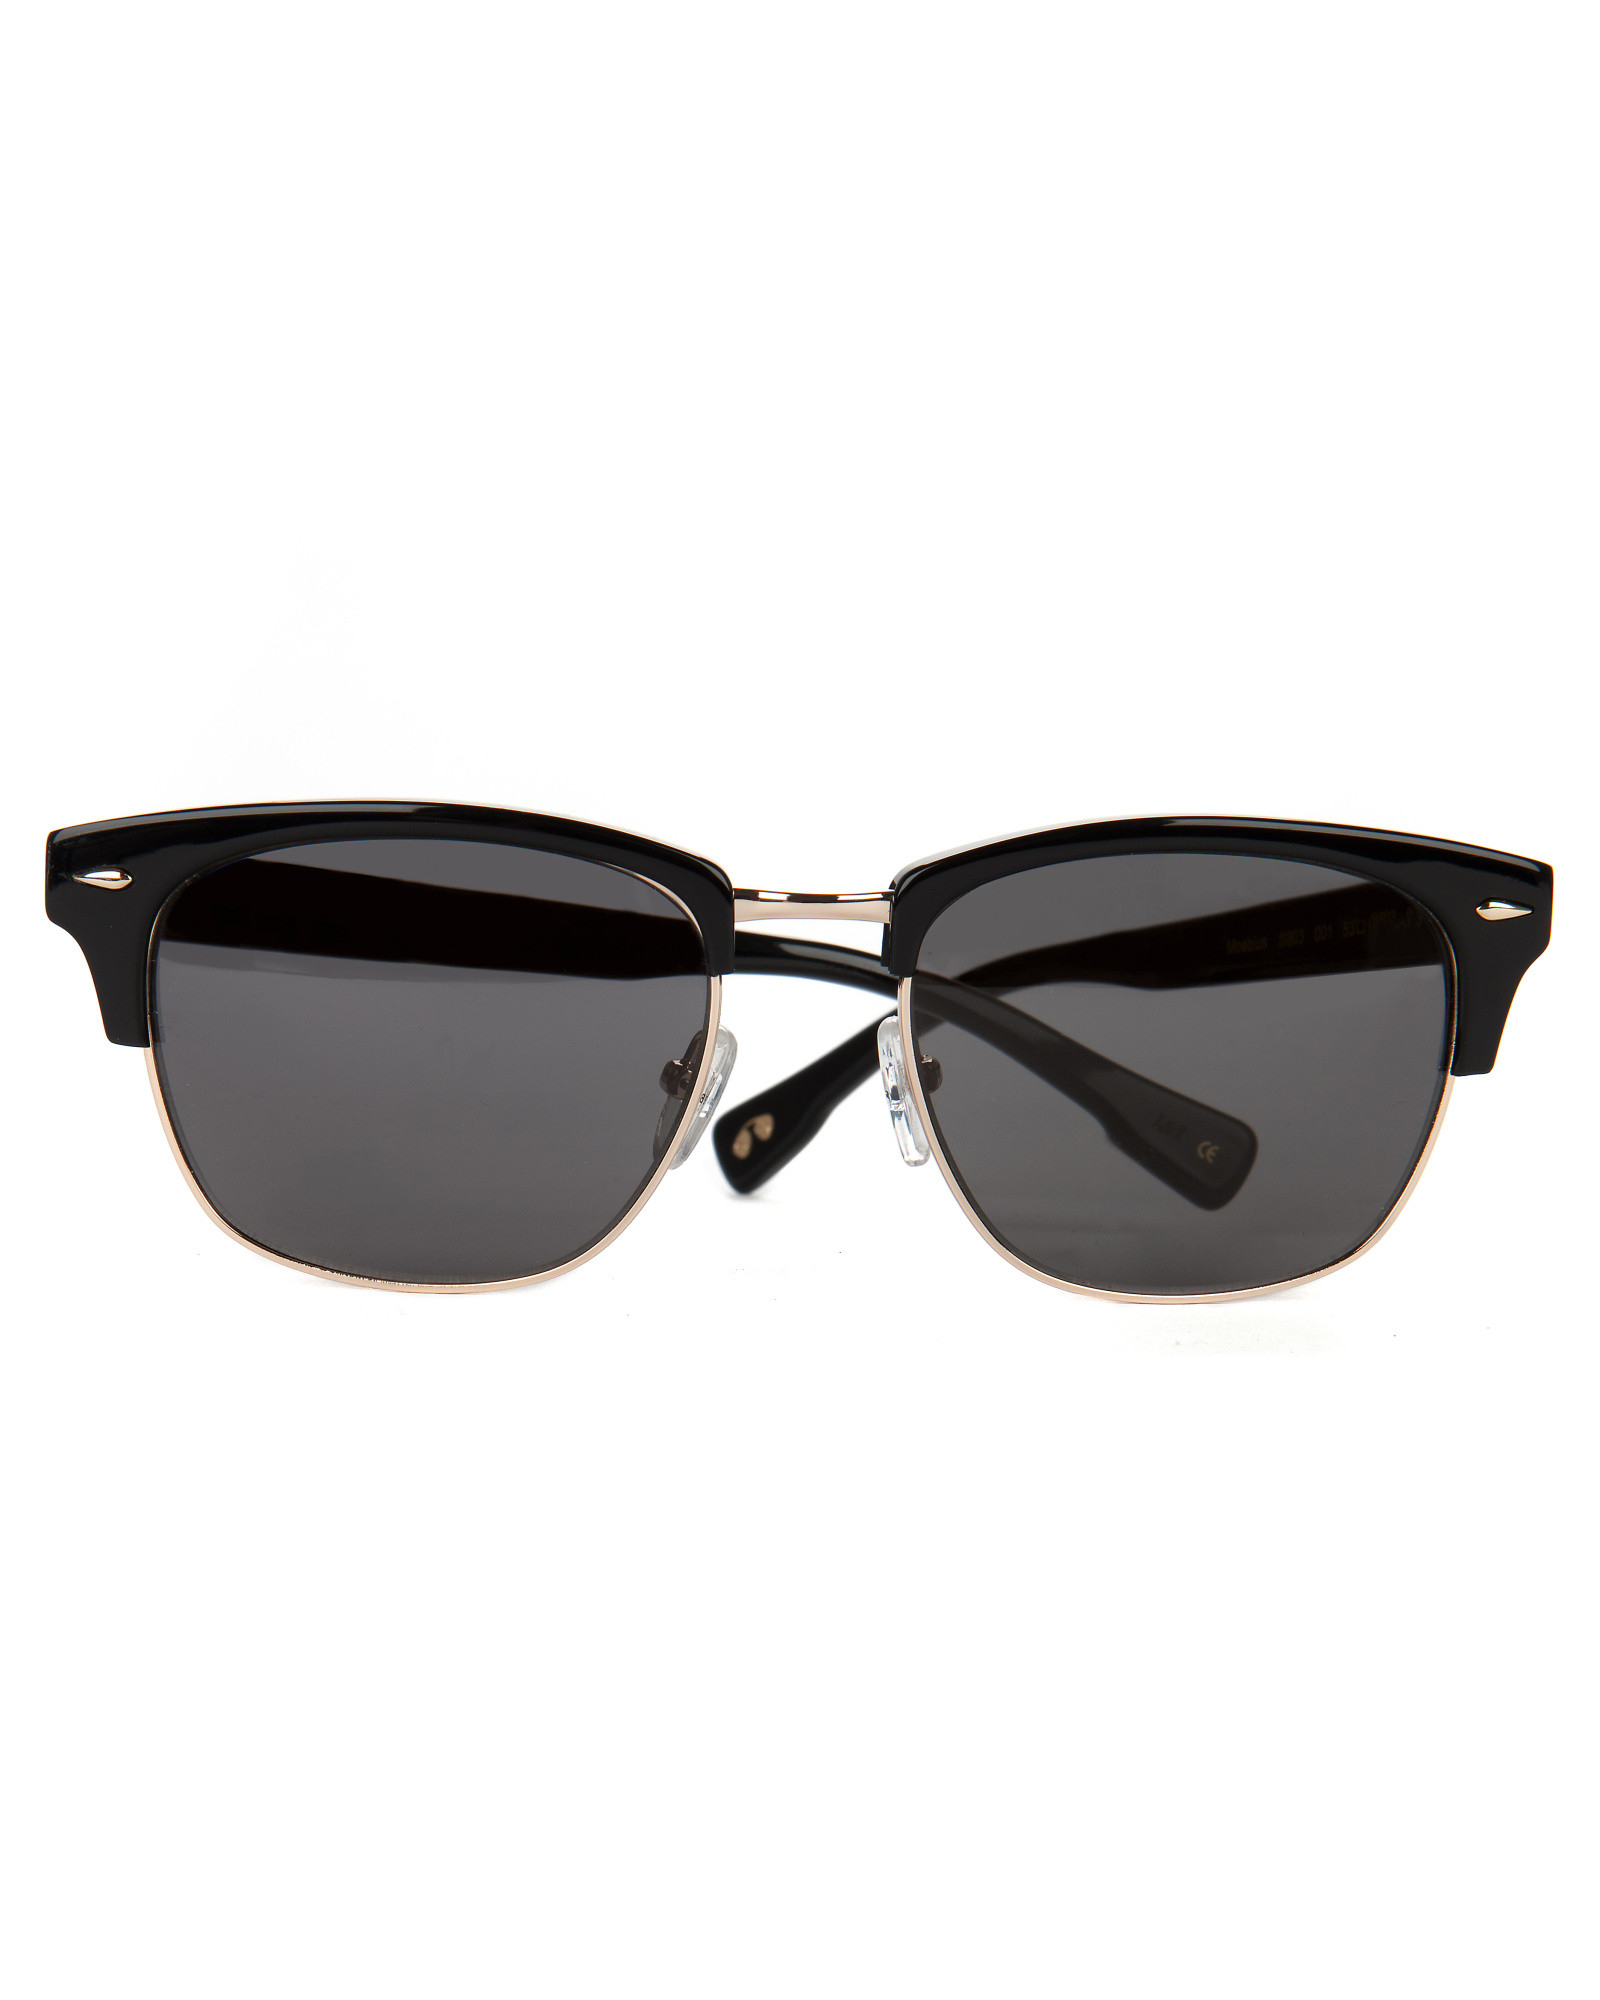 267adcfb07 Ted Baker Sunglasses For Women